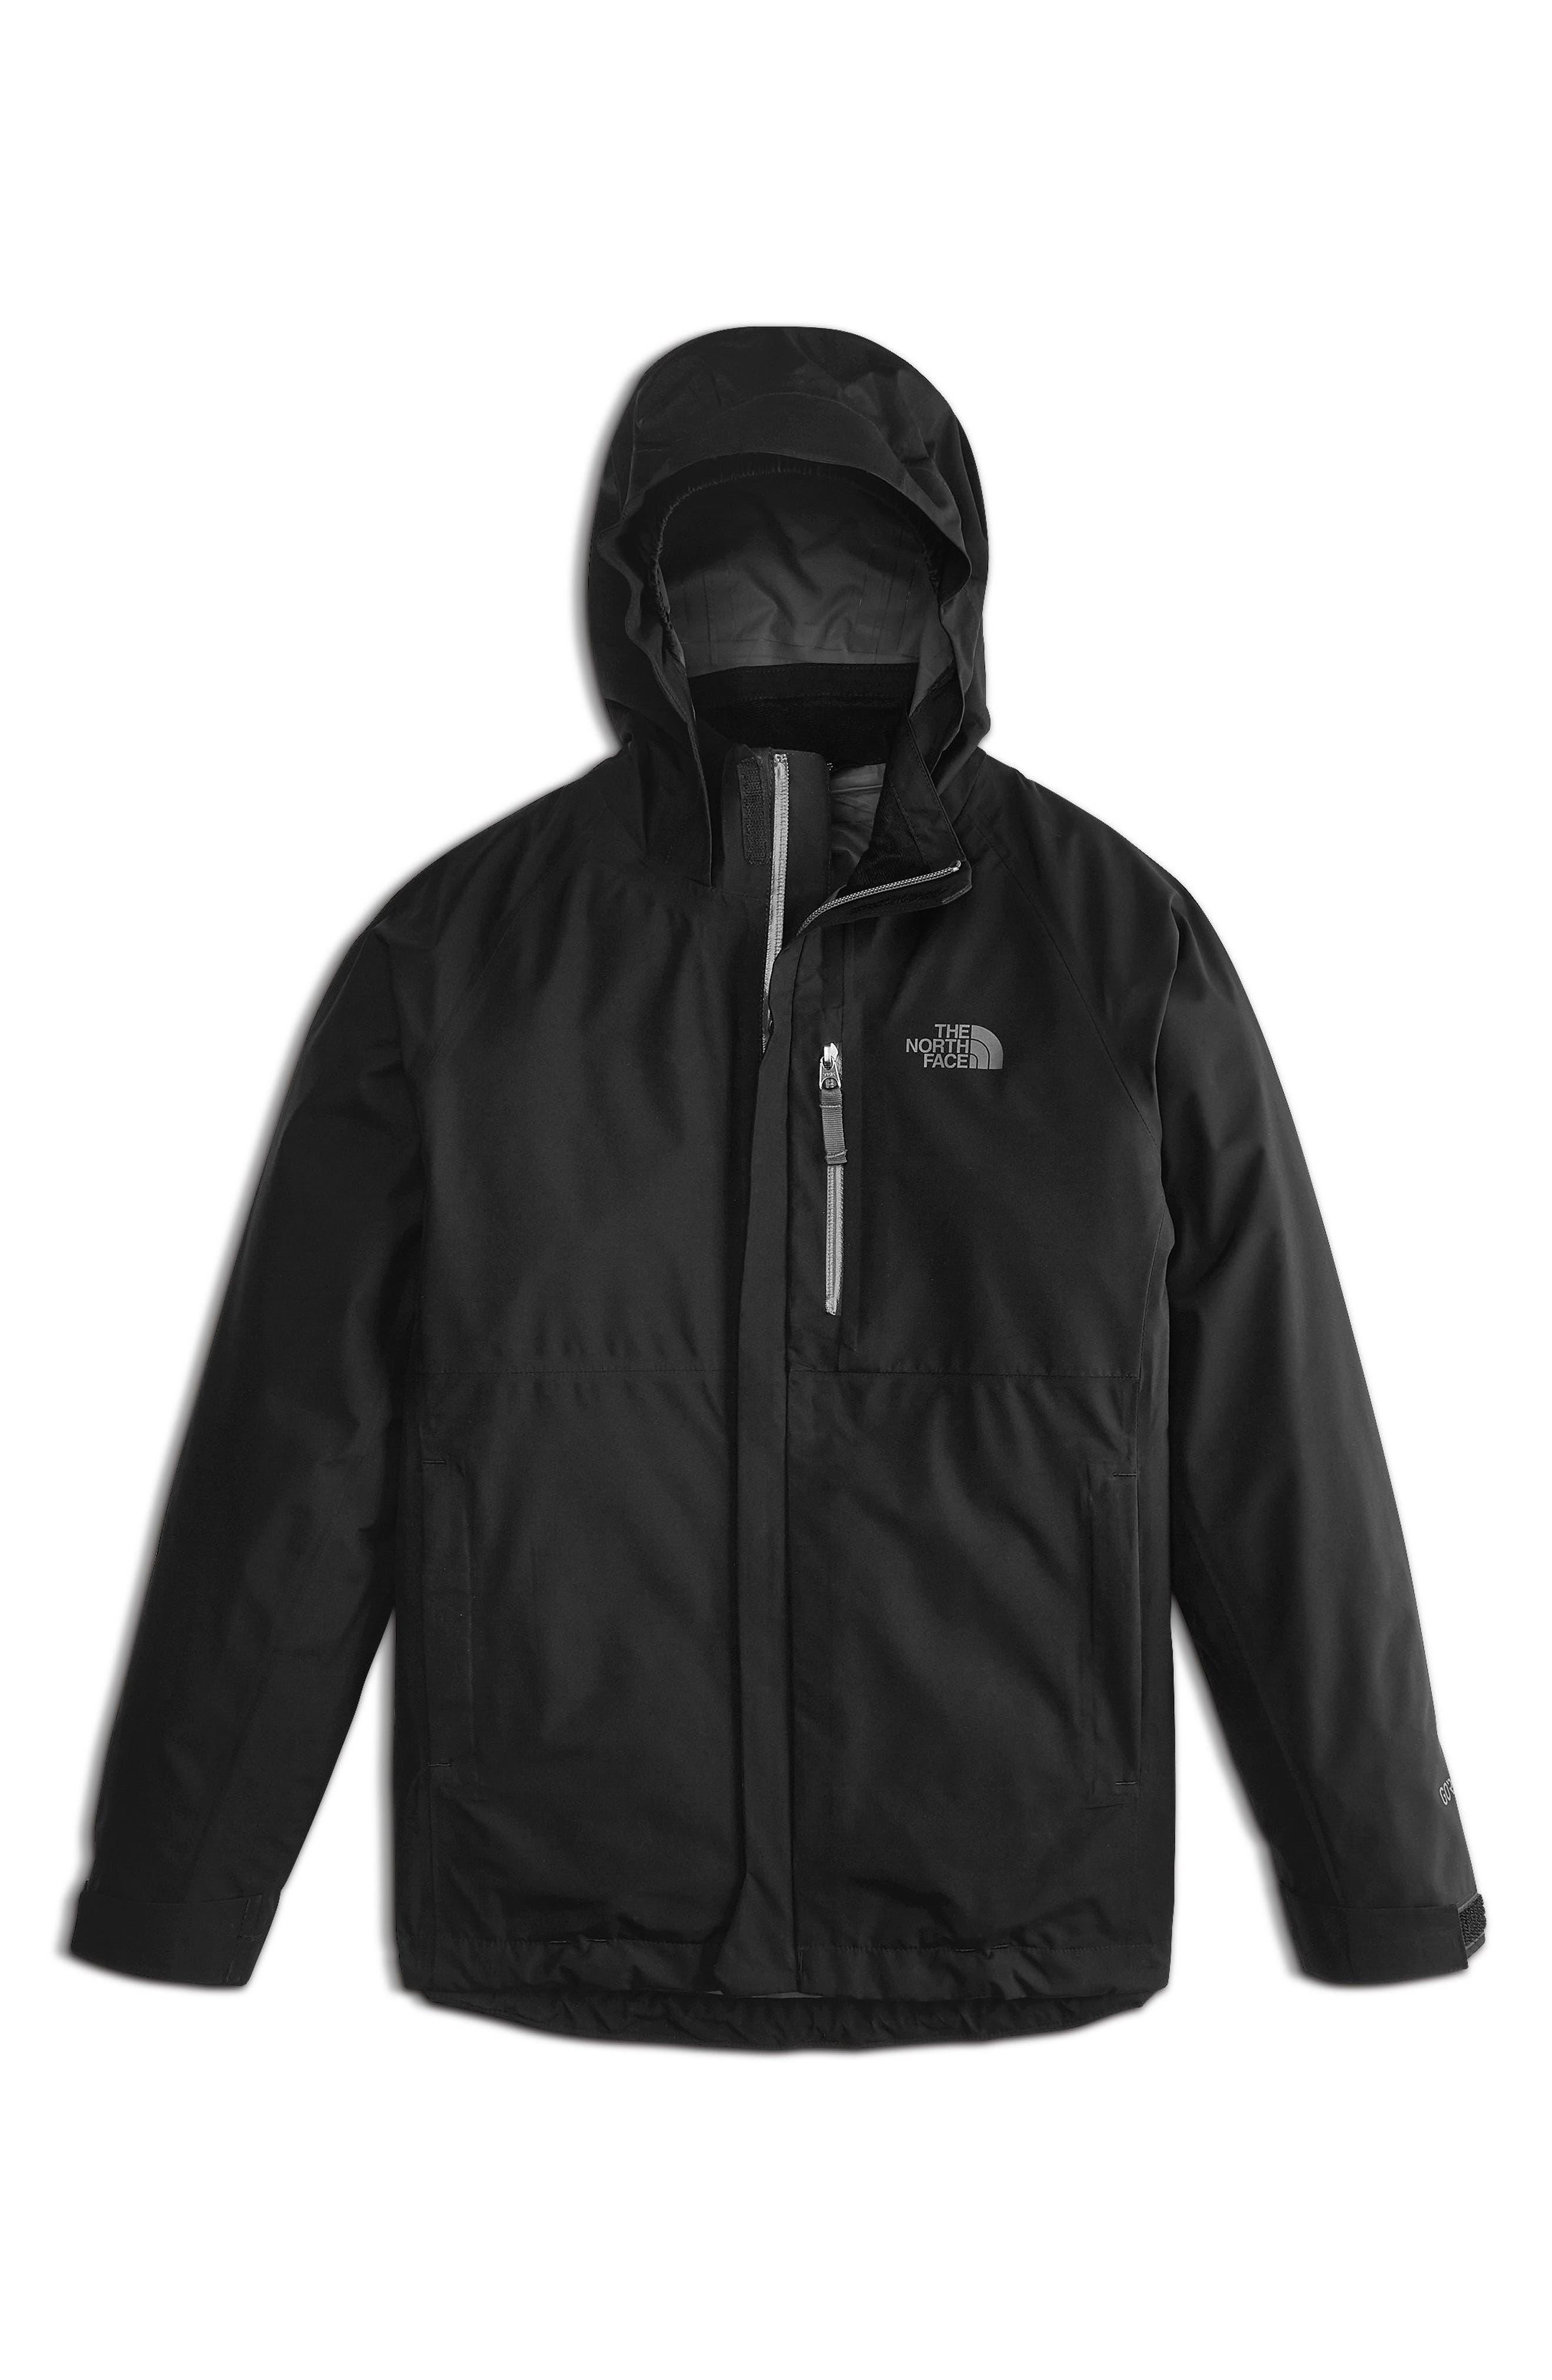 Dryzzle Gore-Tex<sup>®</sup> Waterproof Jacket,                             Main thumbnail 1, color,                             Tnf Black